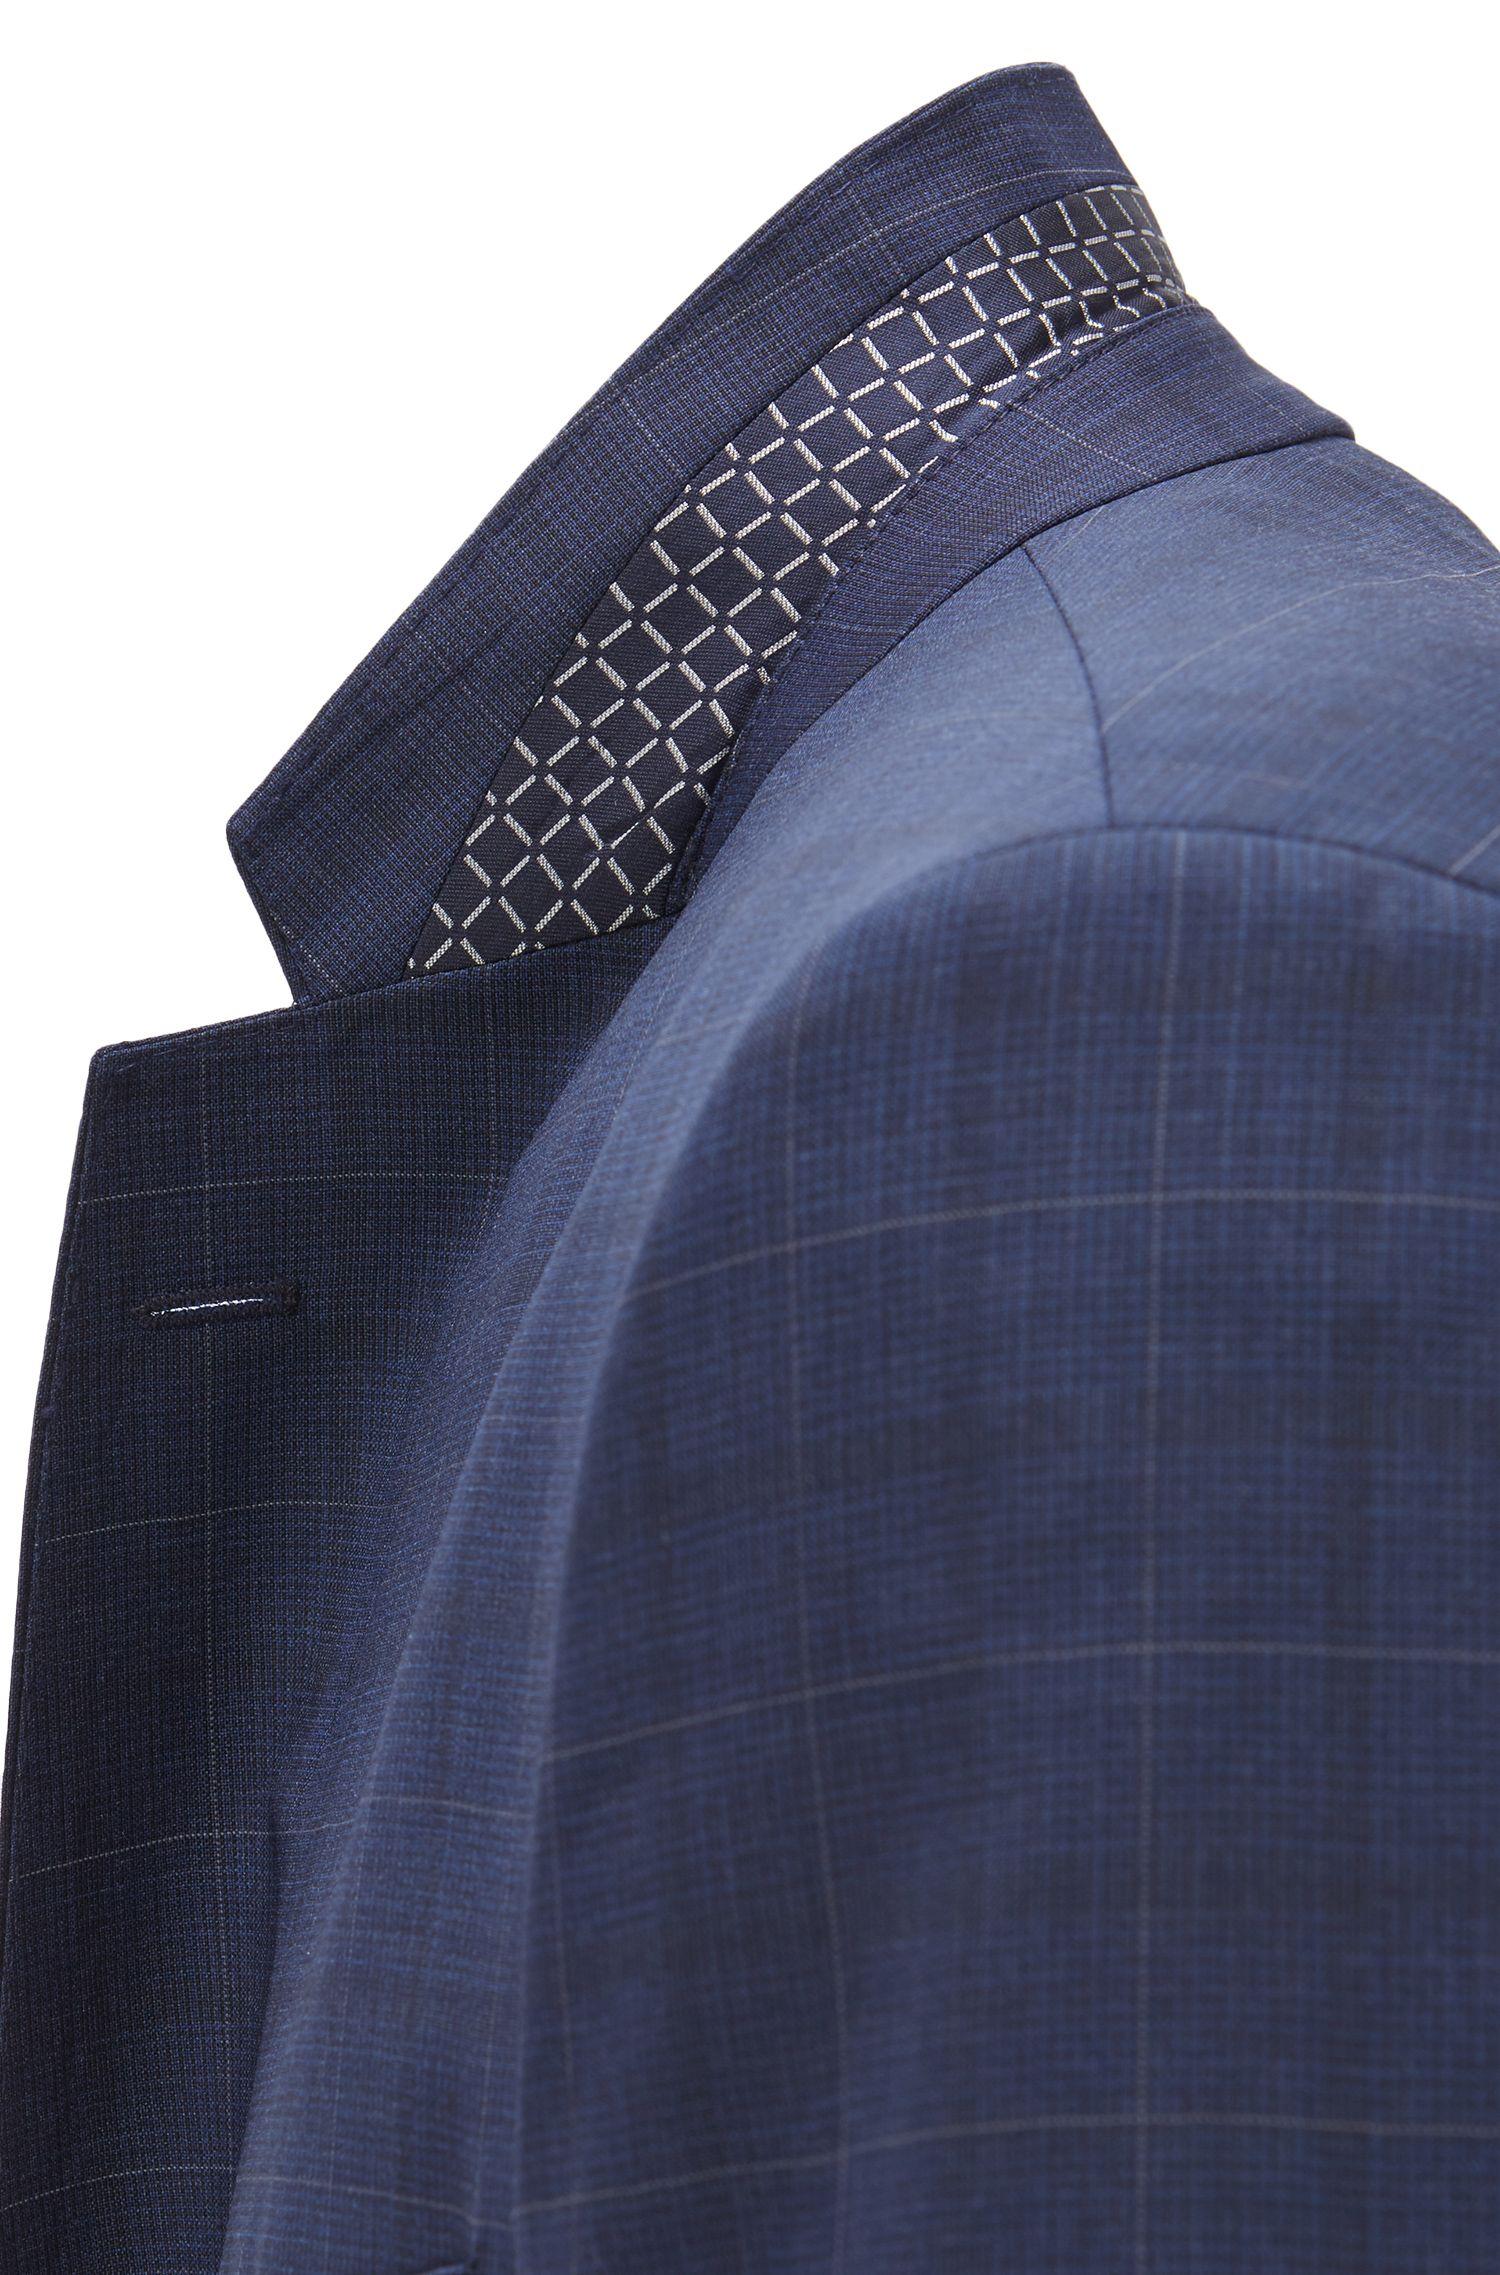 Italian Wool Suit, Regular Fit   C-Jeys/C-Shaft